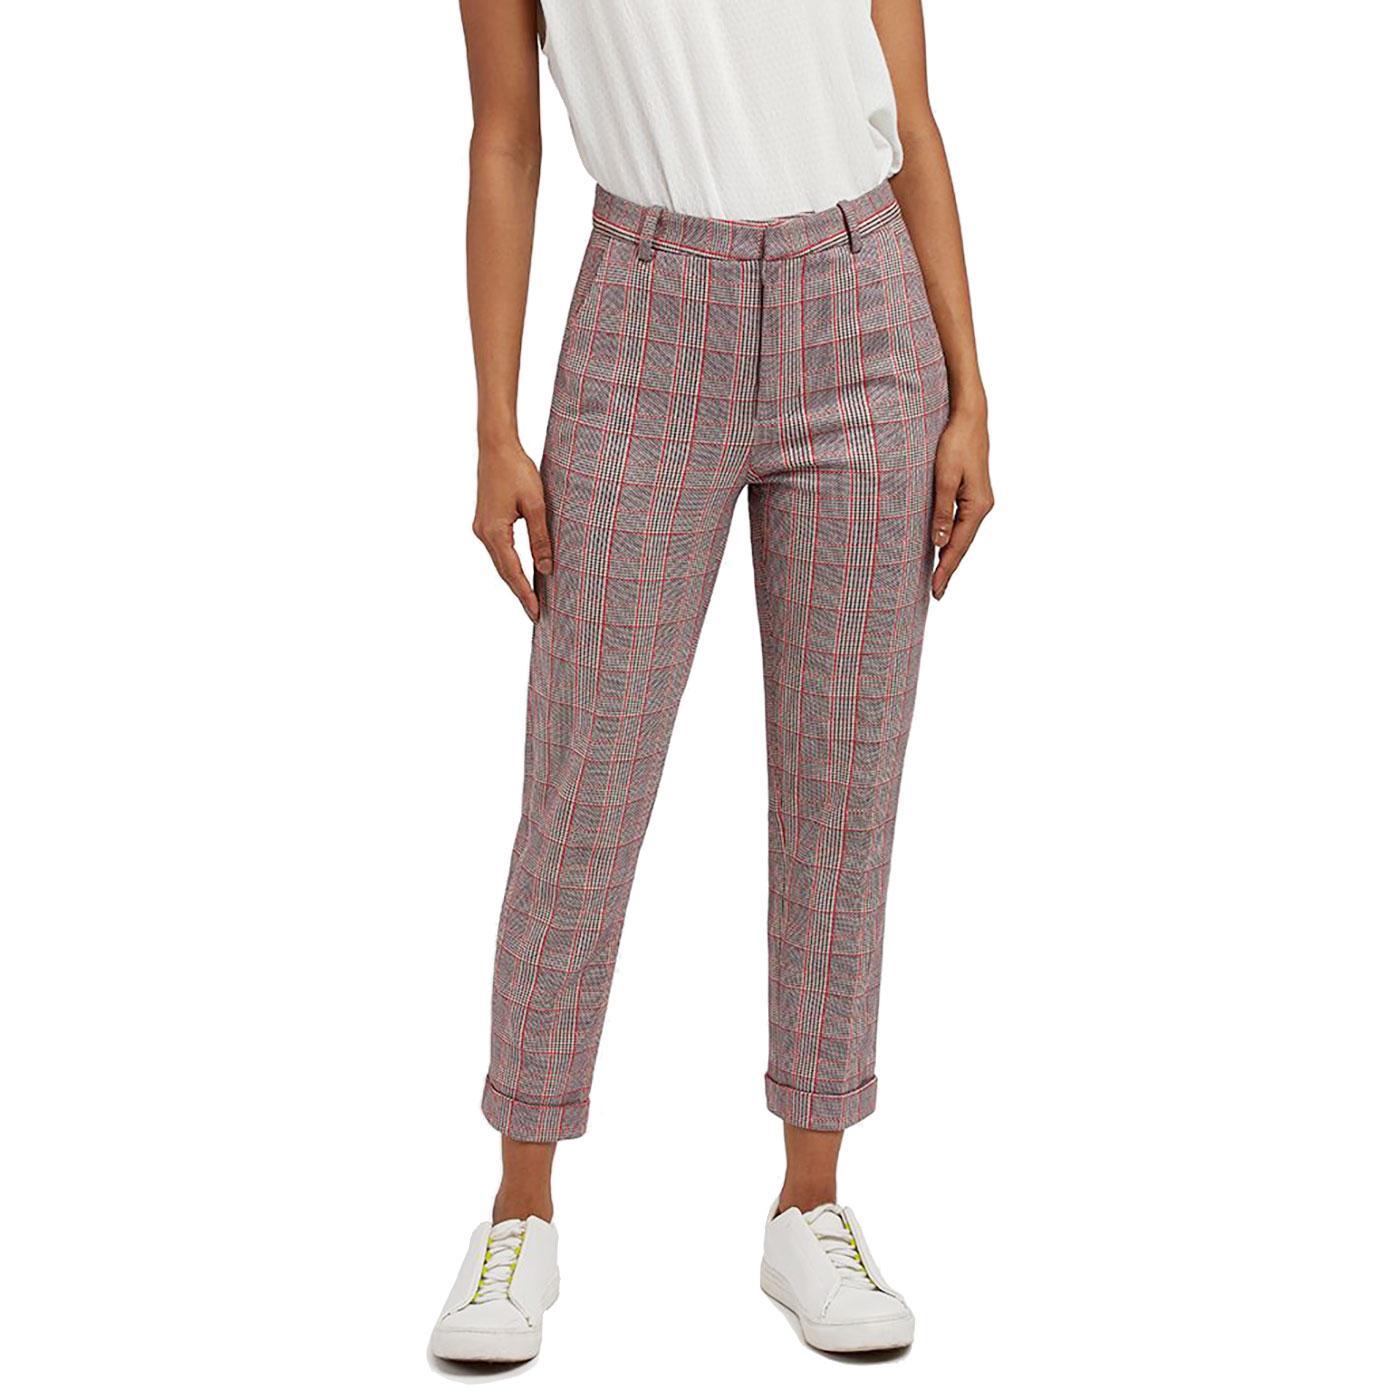 Jaylo LOUCHE Women's Retro Cropped Check Trousers